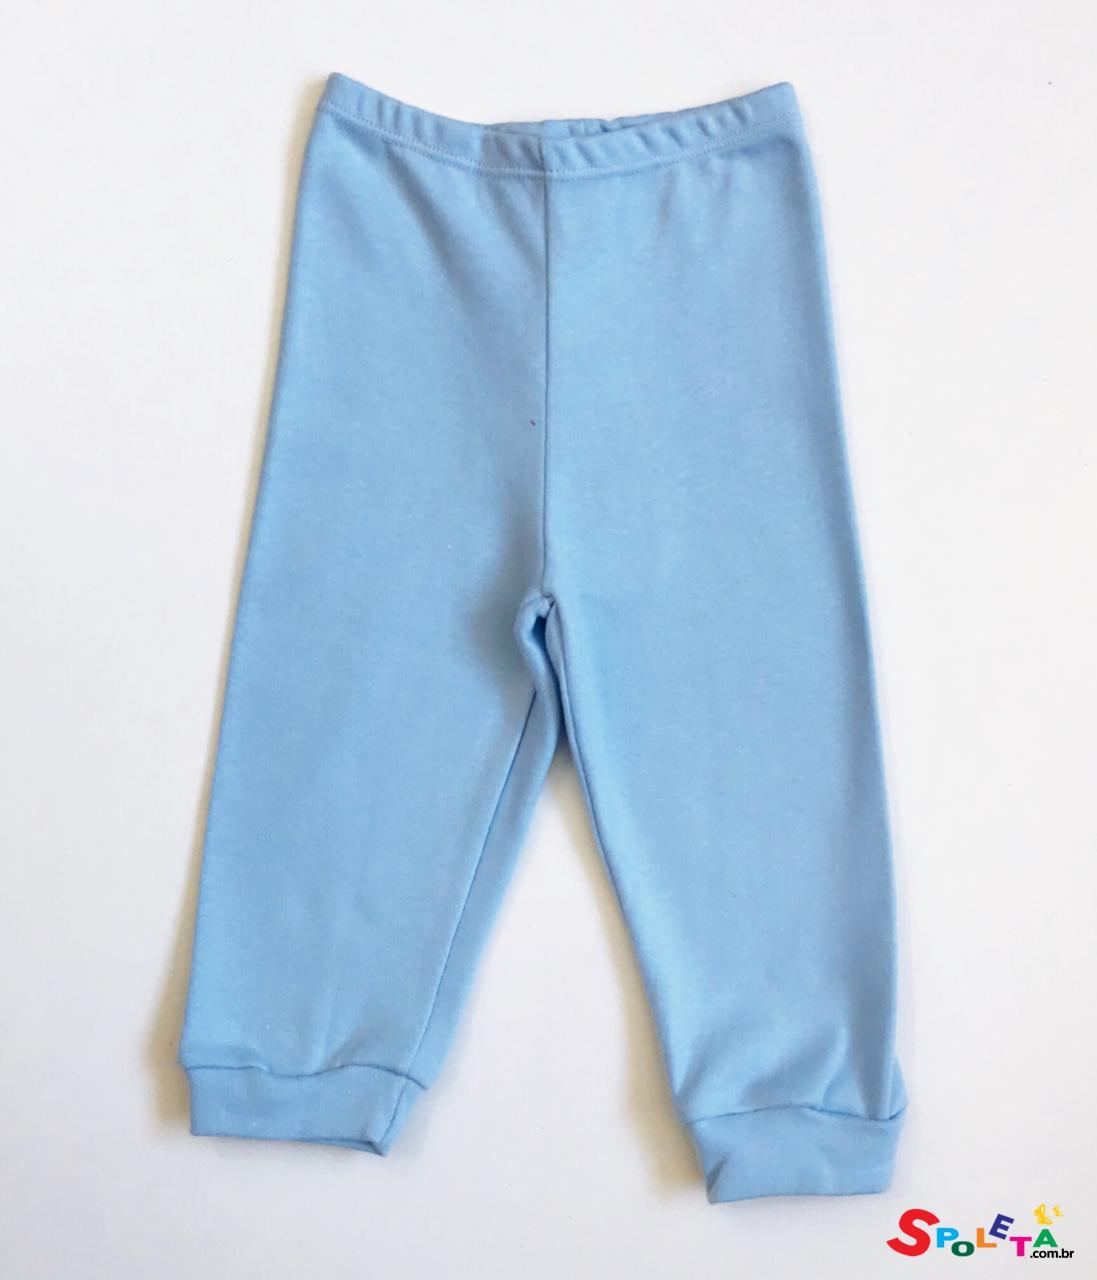 Culote básico azul